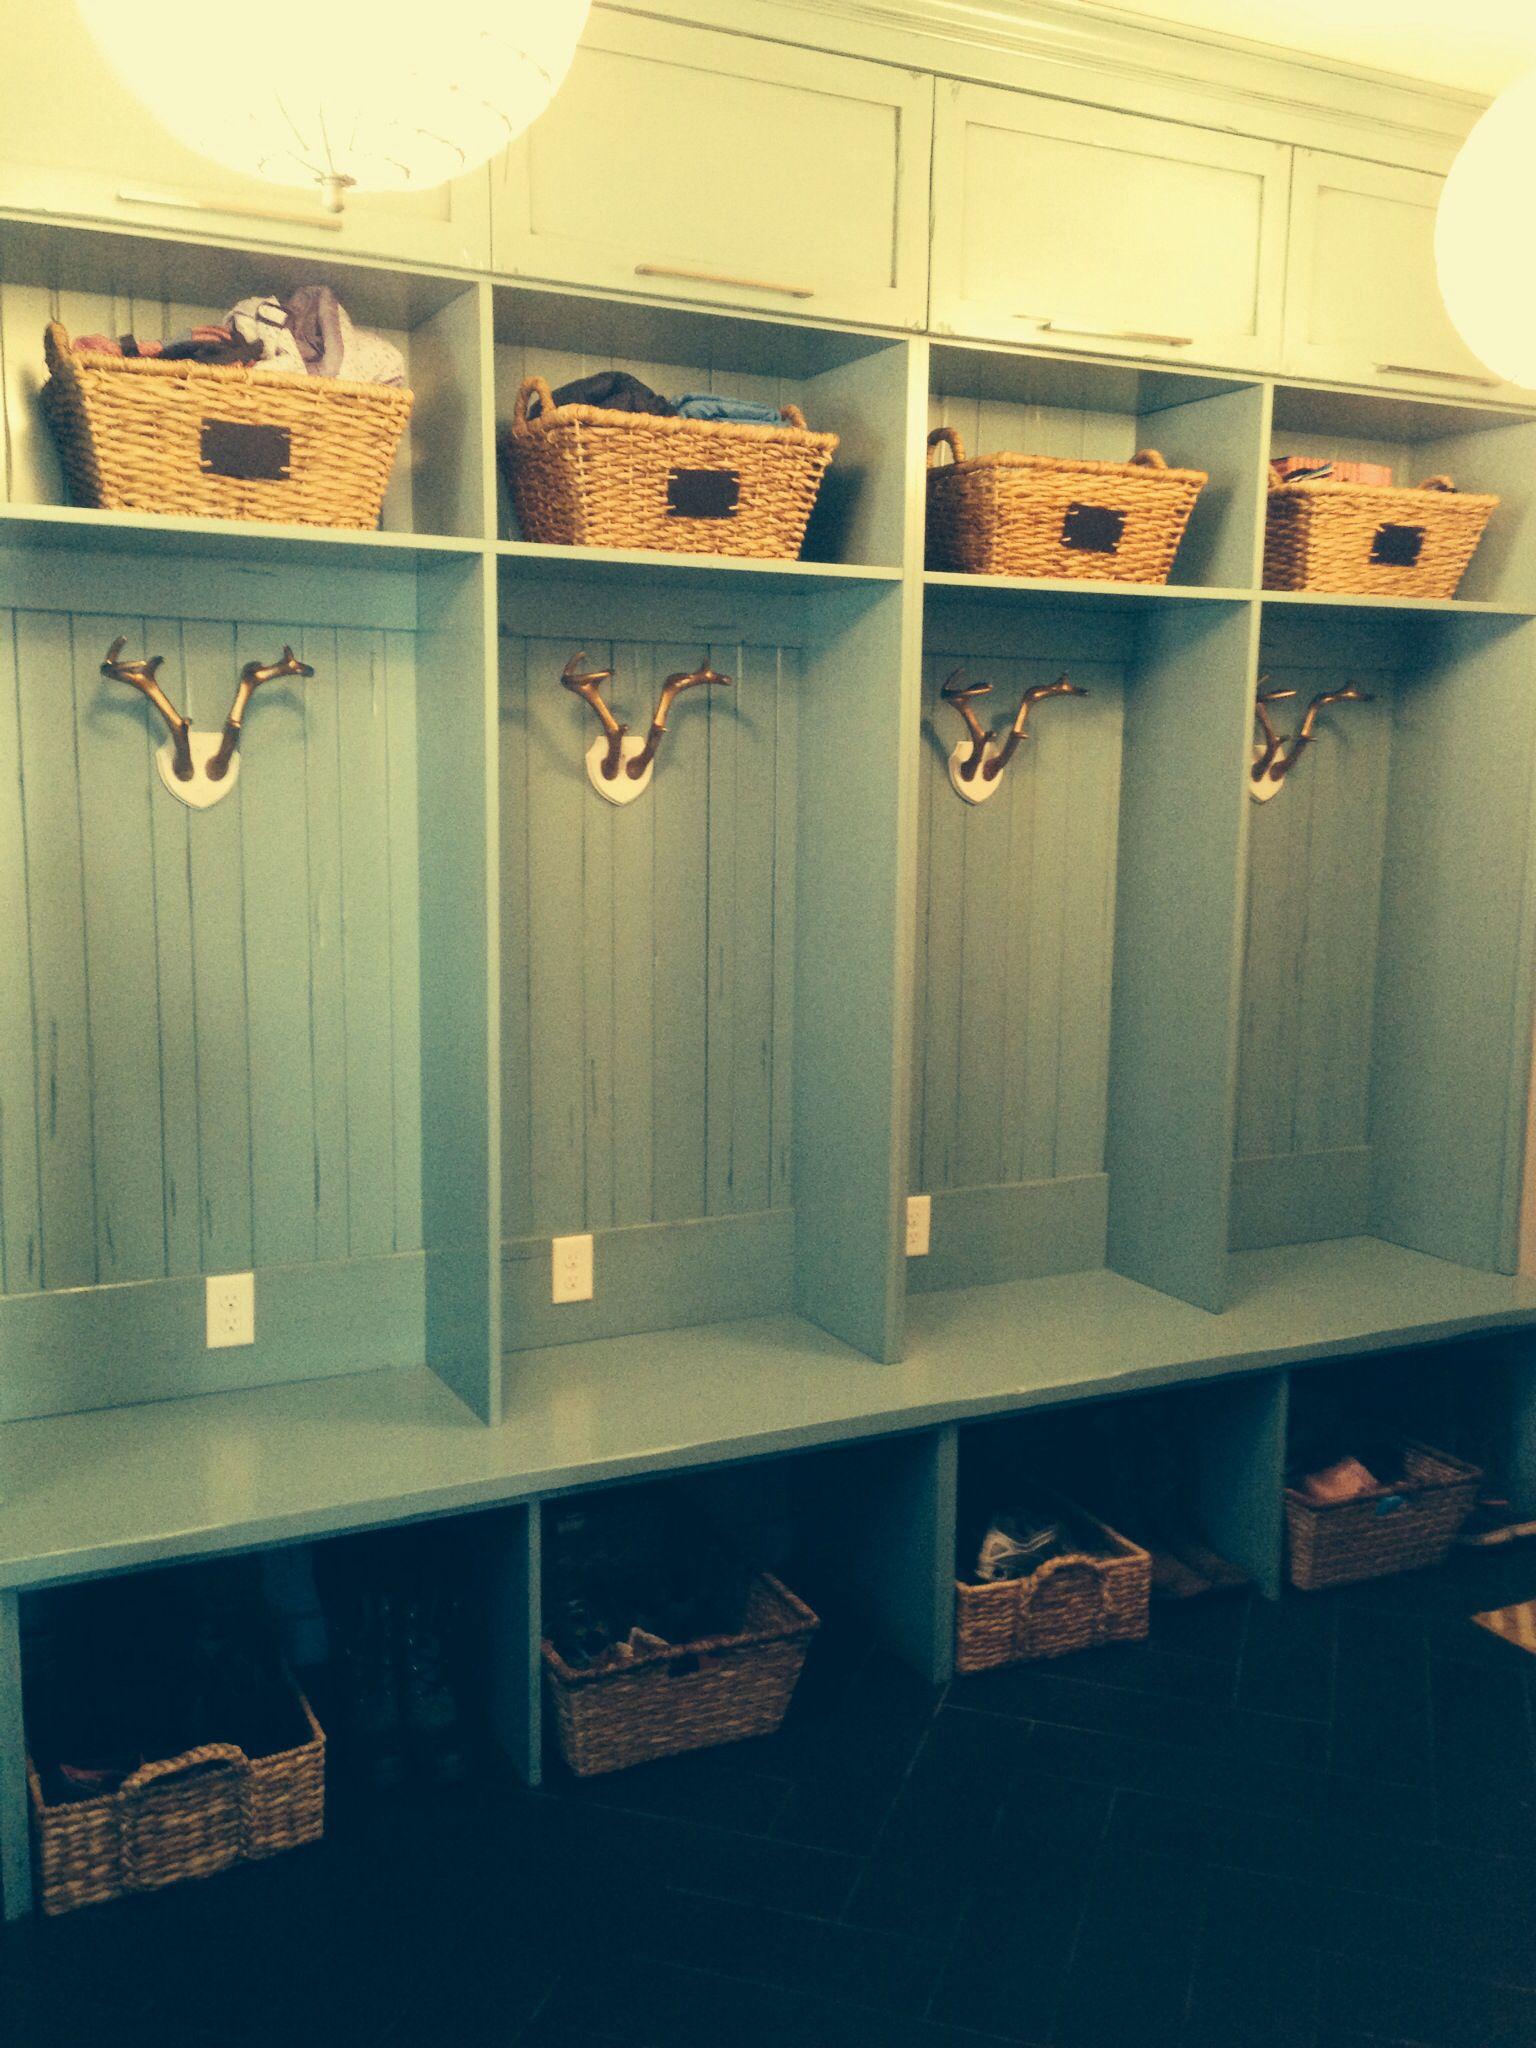 Target Threshold Baskets For Mudroom Lockers